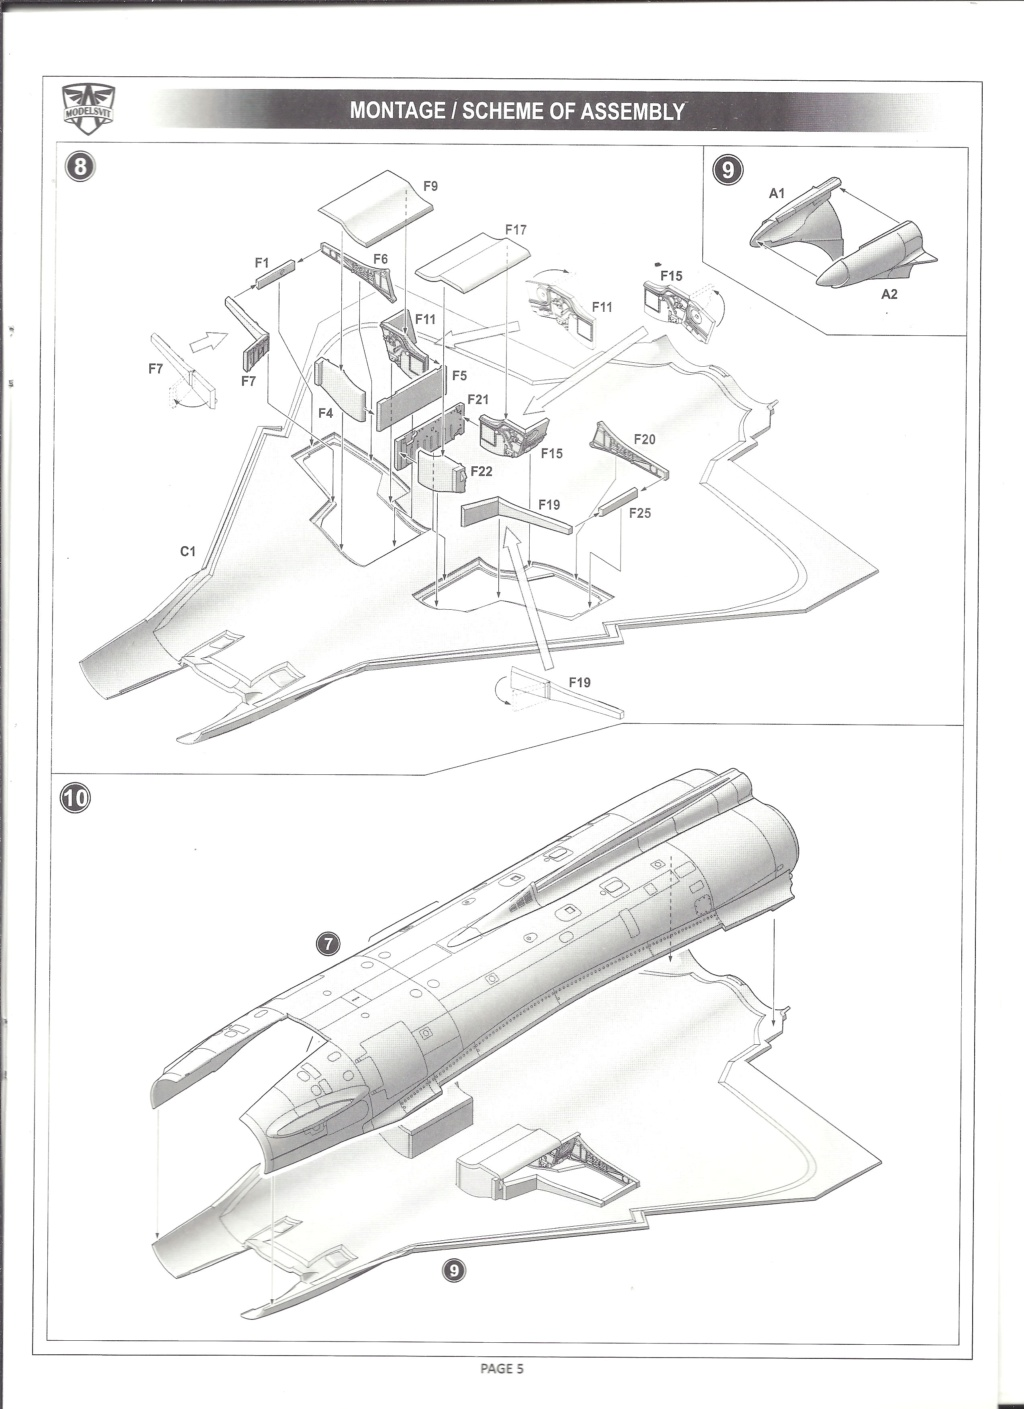 [MODELSVIT] DASSAULT MIRAGE 4000 1/72ème Réf 72052 Notice Models16